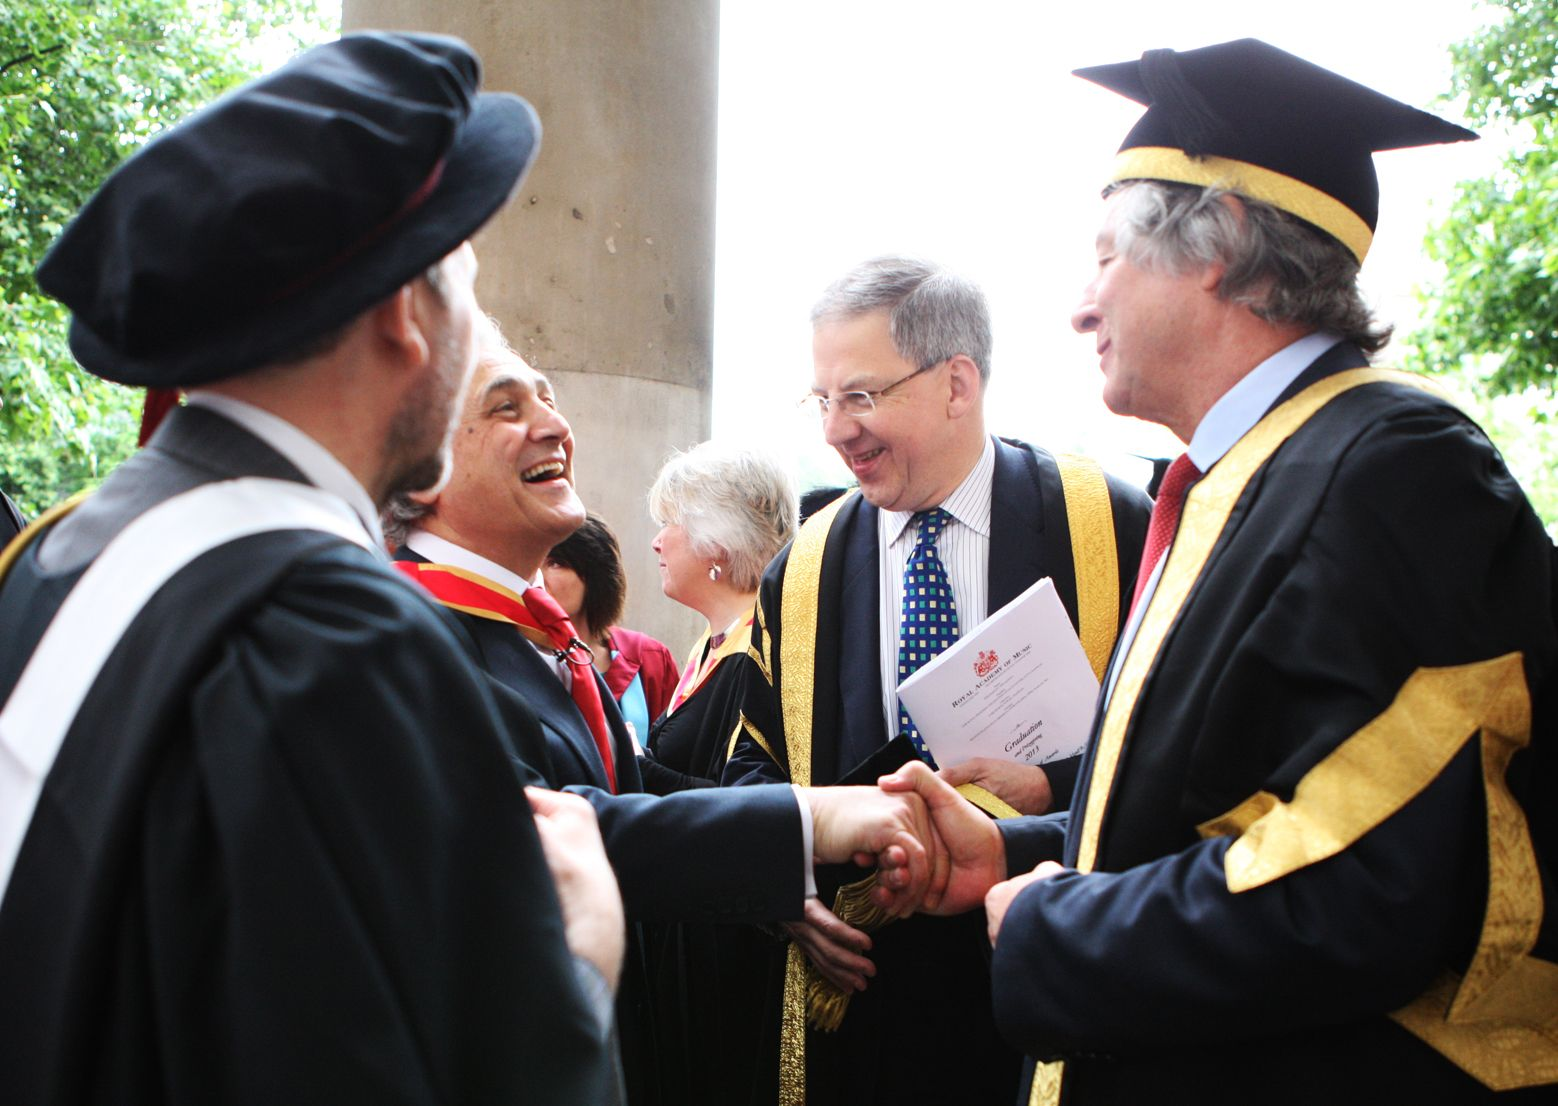 Graduation 2013. © Royal Academy of Music, June 2013